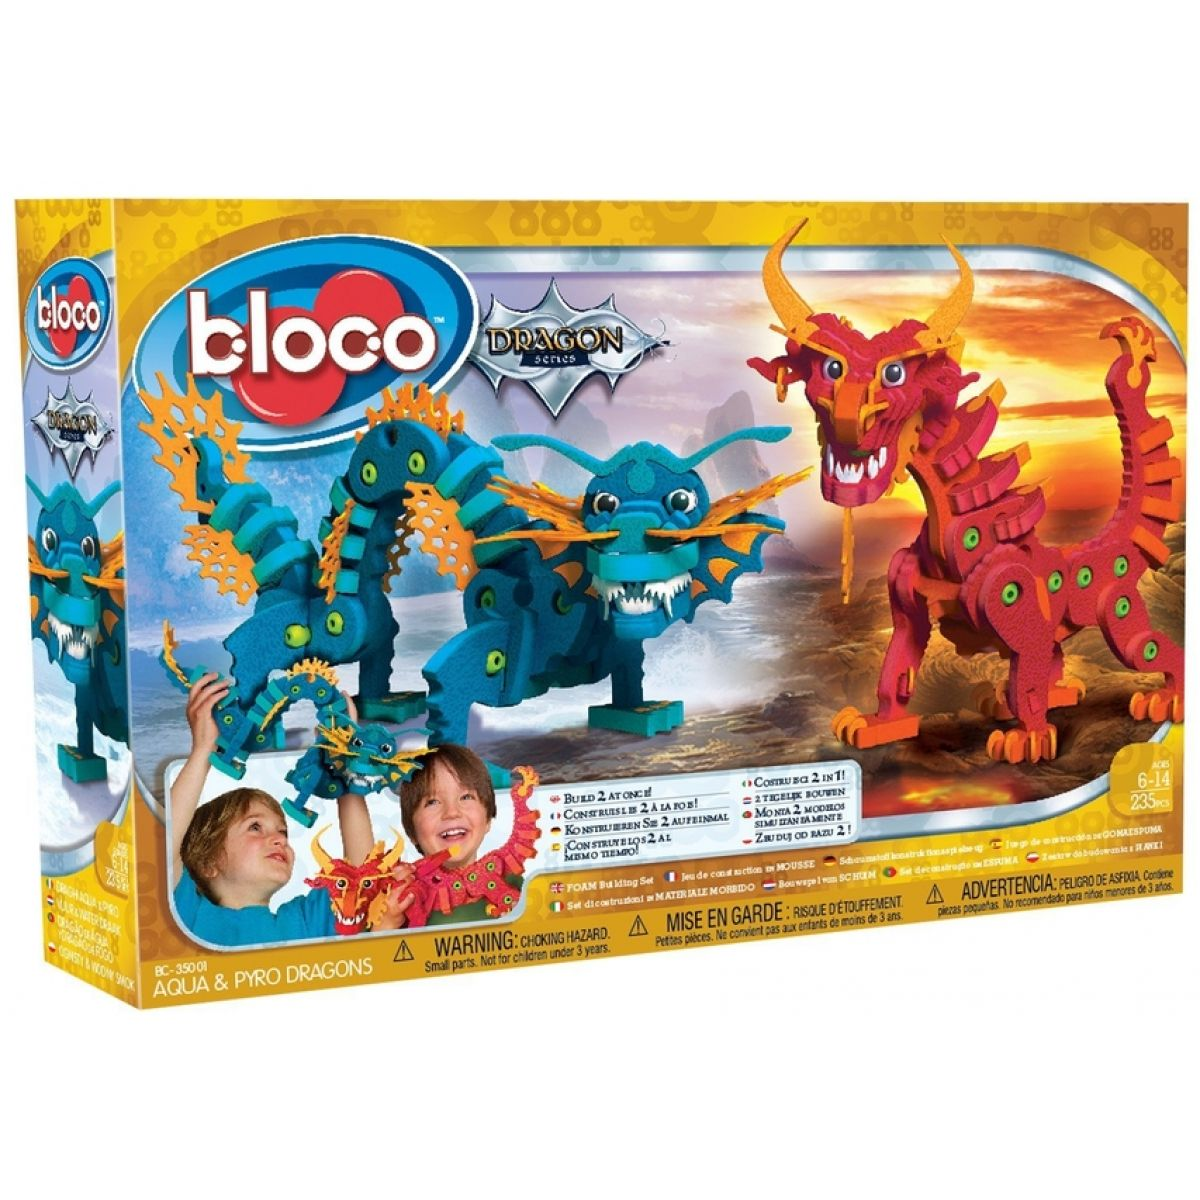 Bloco - Draci ohně a vody